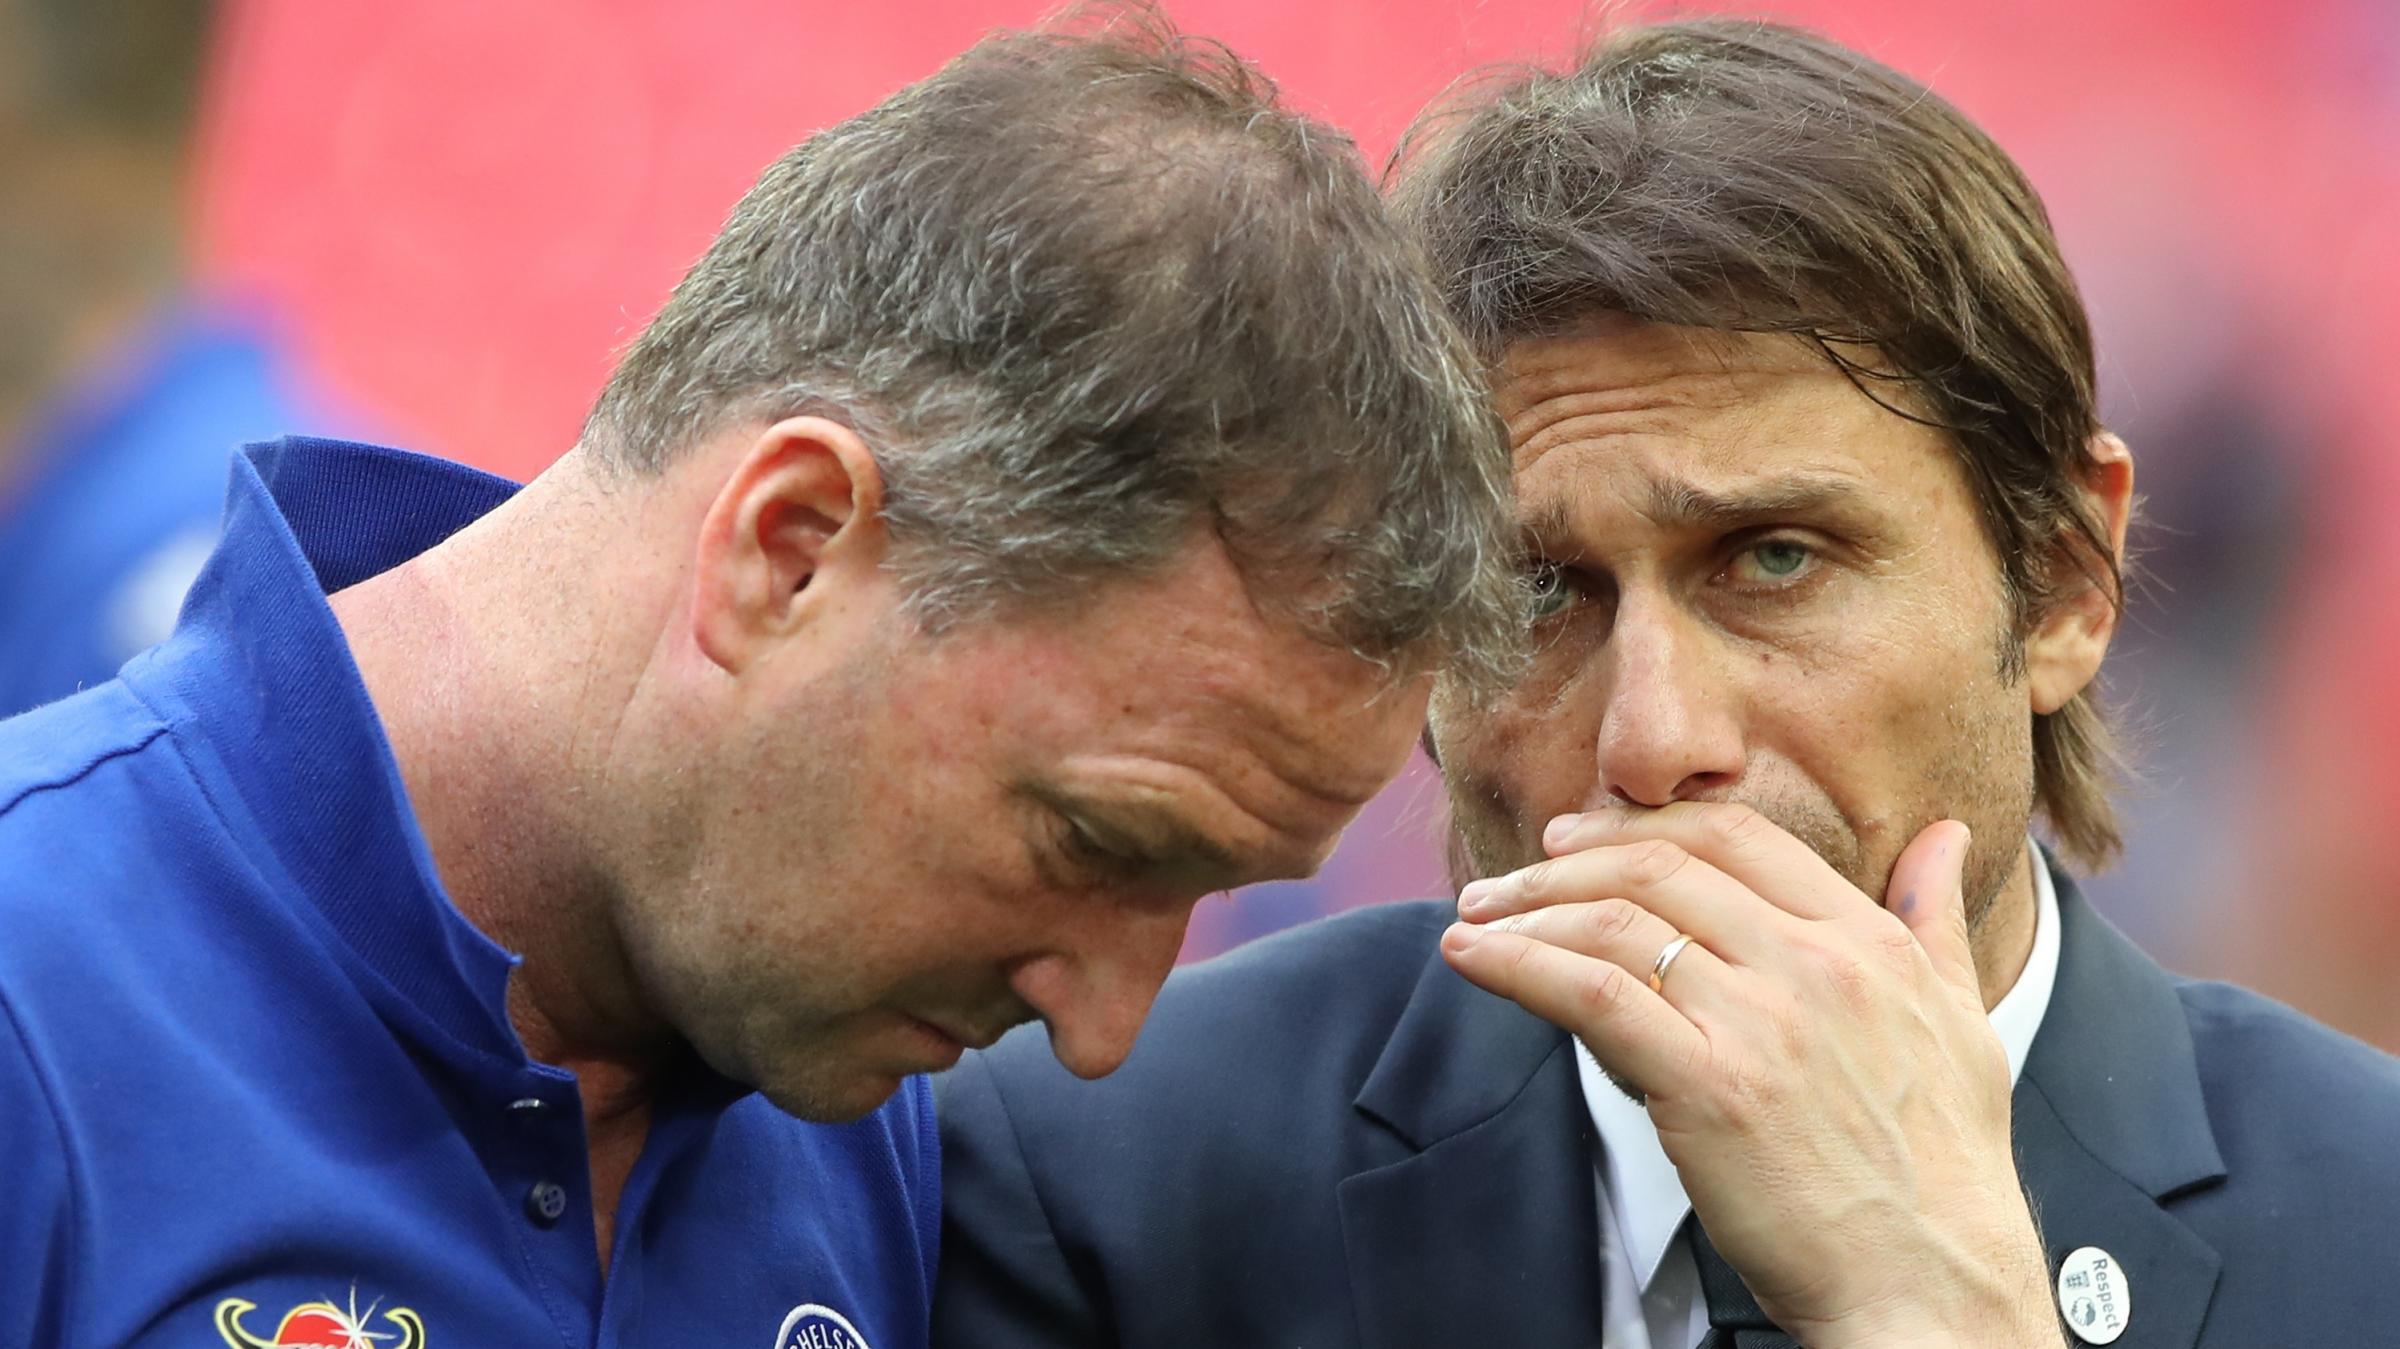 Antonio Conte no closer to signing new Chelsea contract